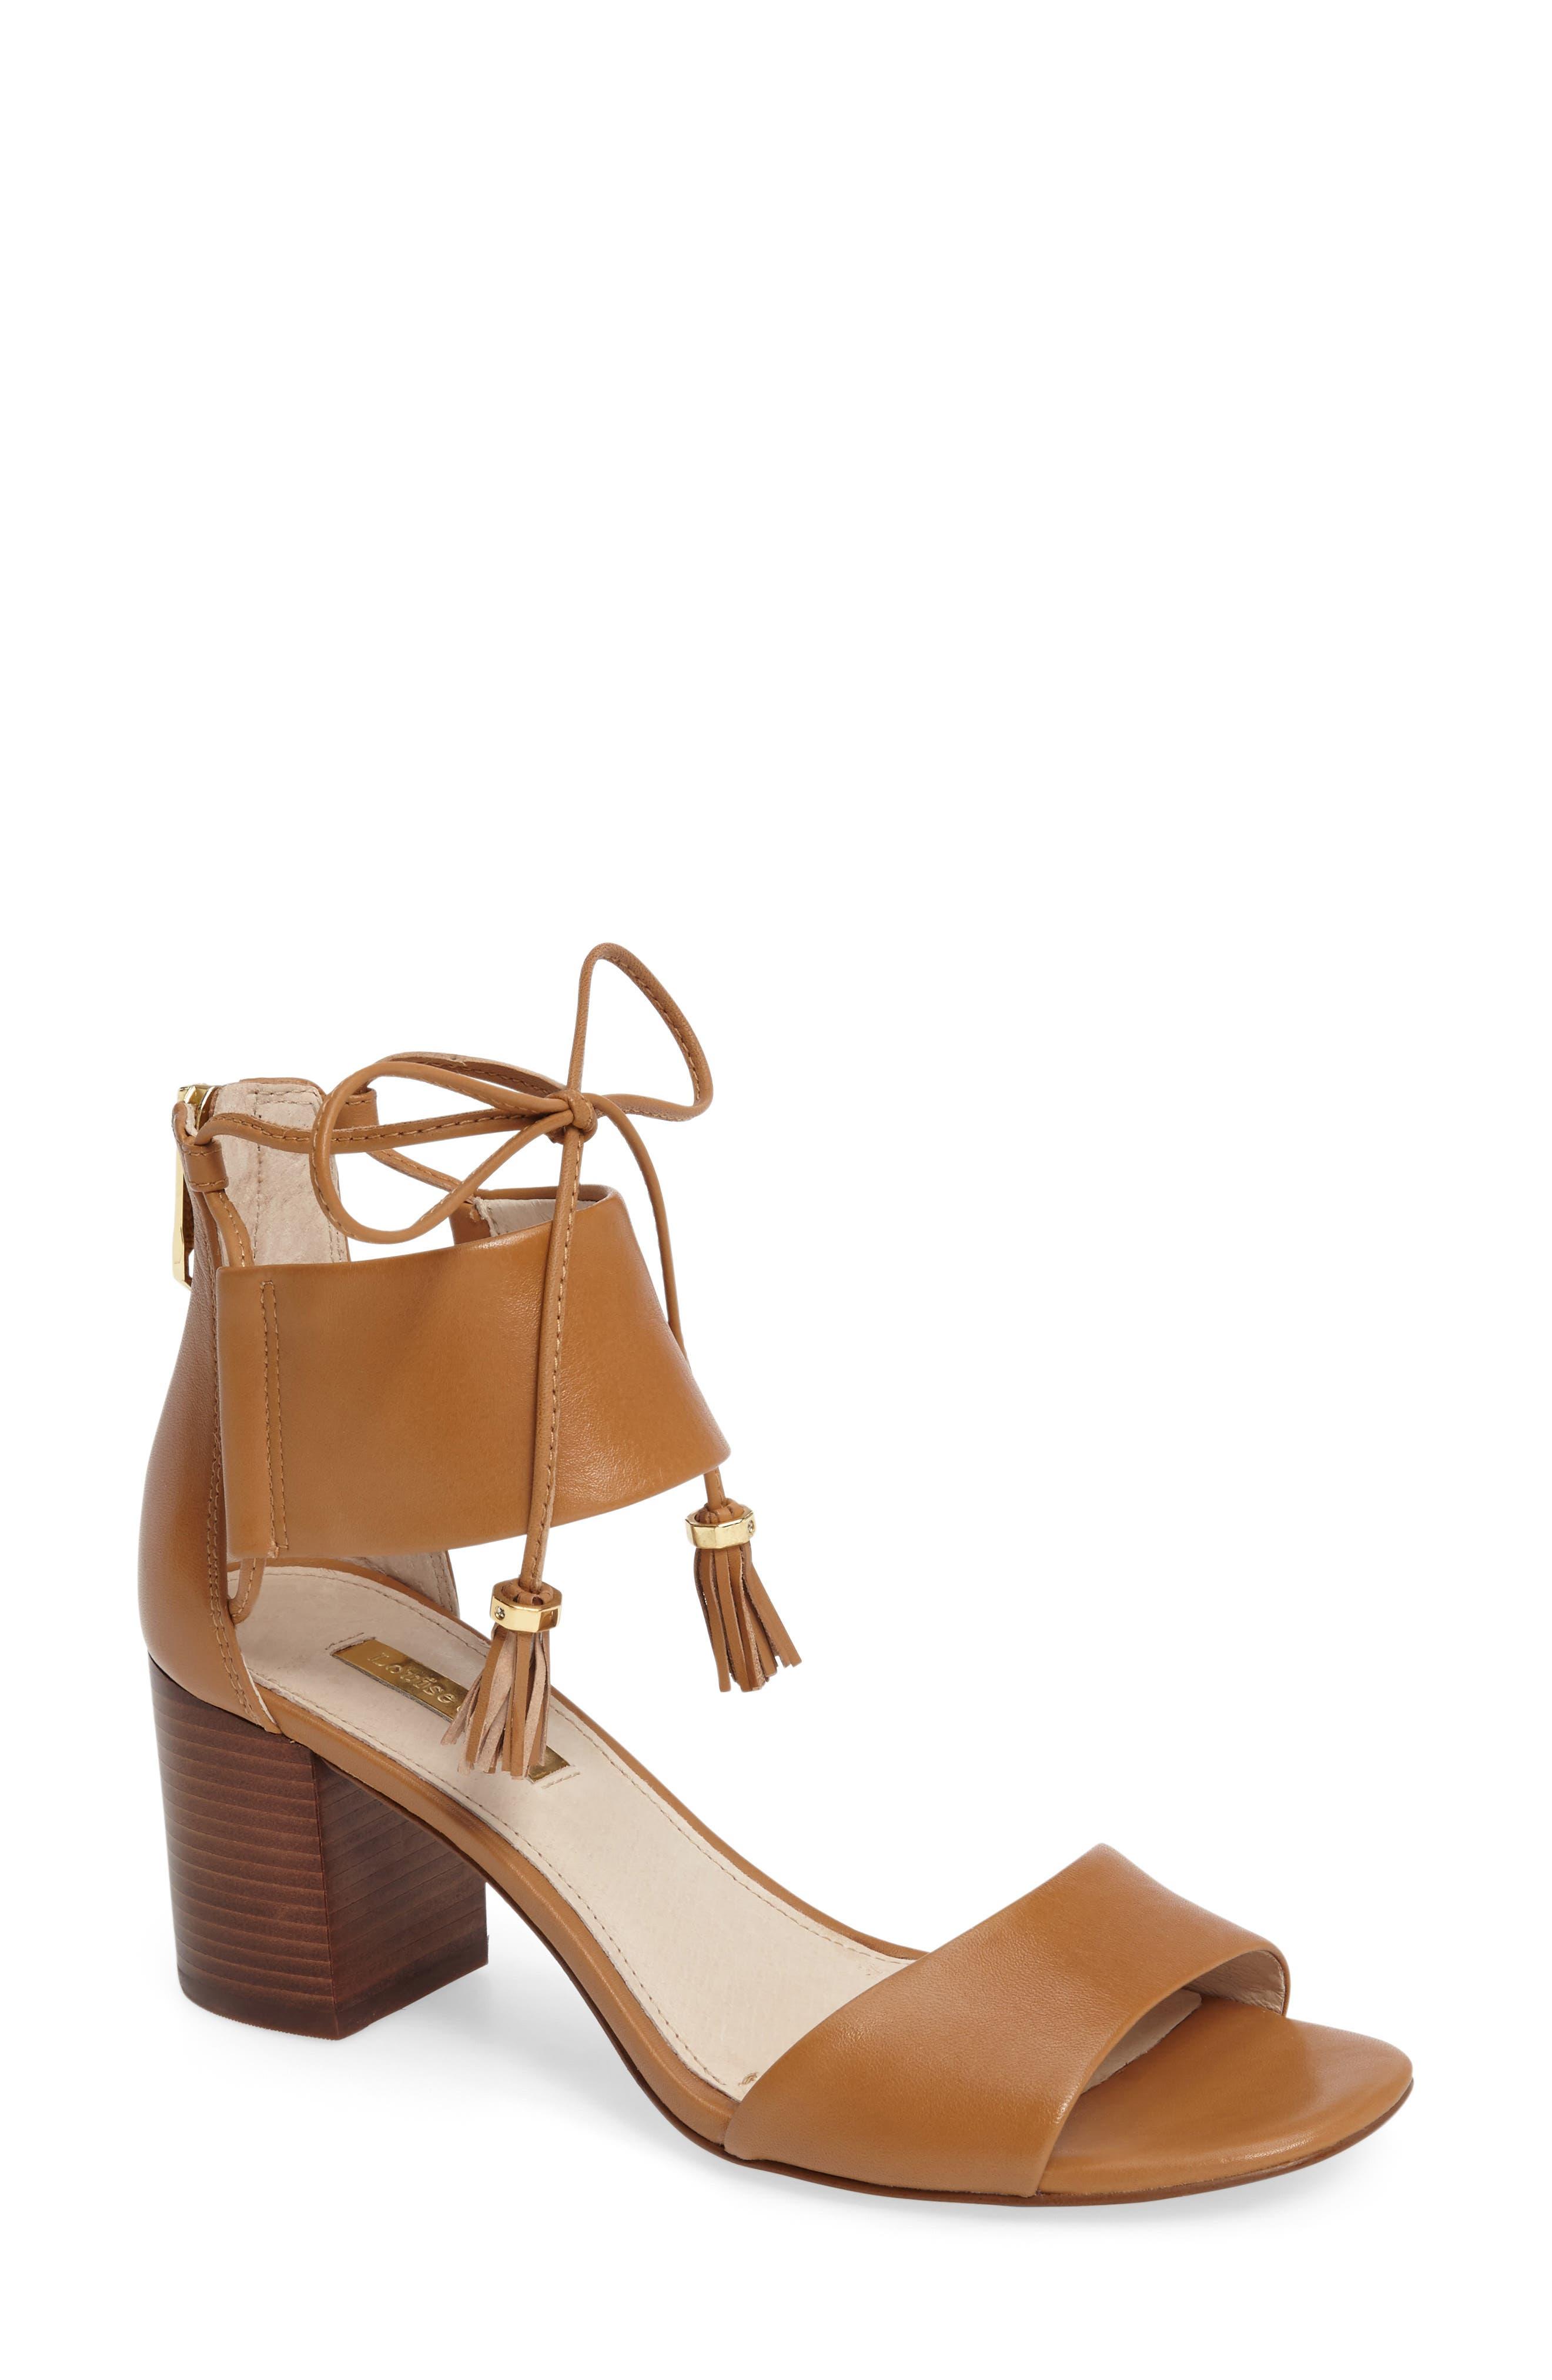 Keegan Block Heel Sandal,                             Main thumbnail 1, color,                             True Tan Leather